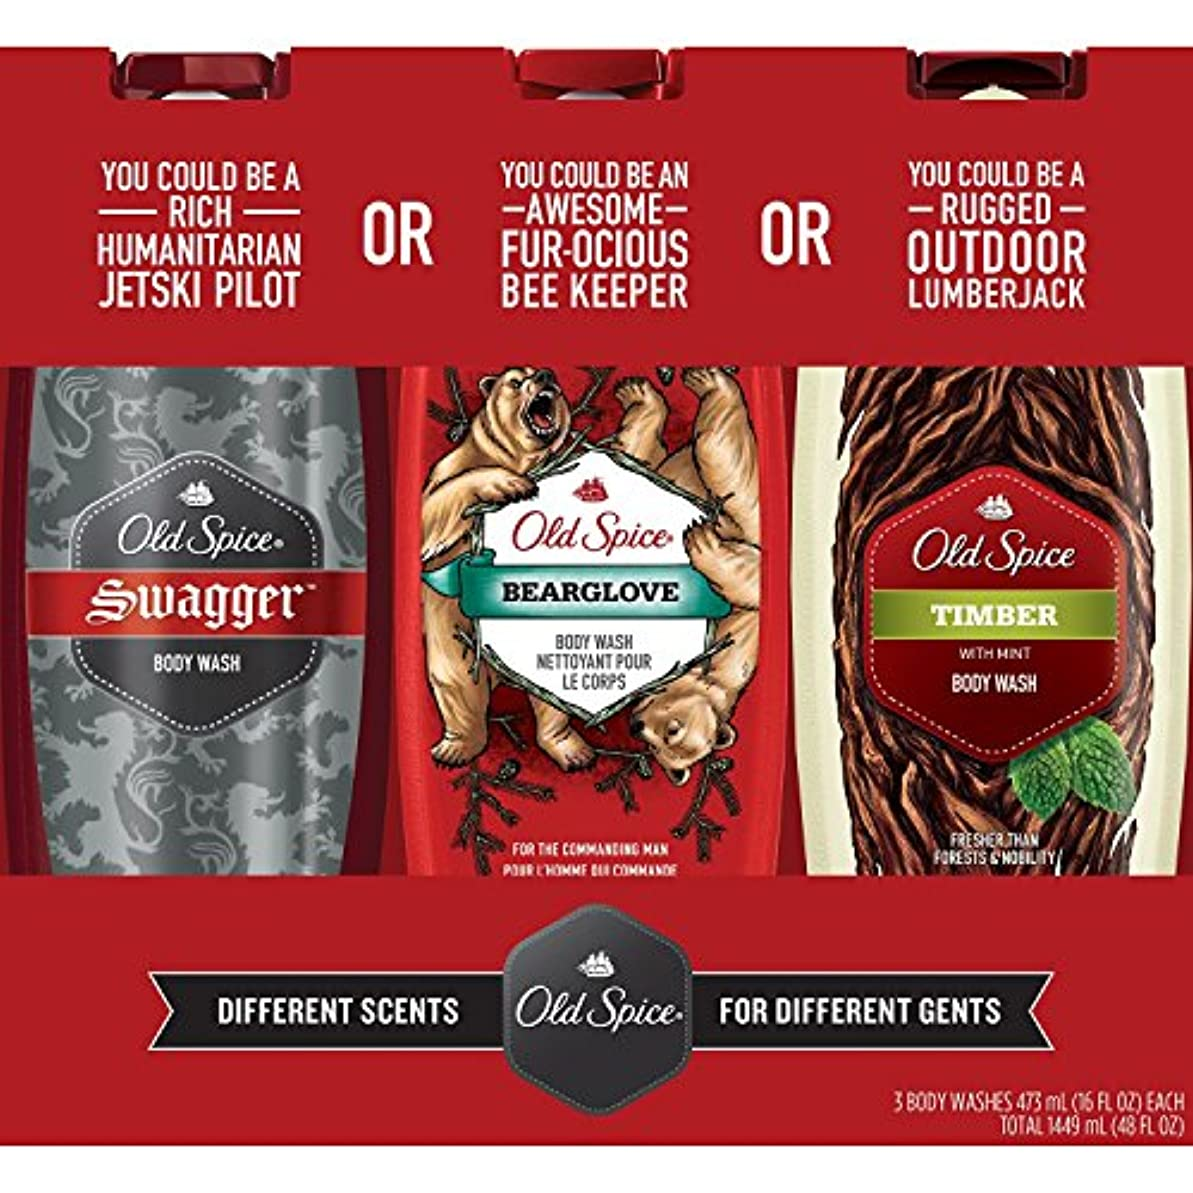 混沌条約触手Old Spice Body Wash Variety Pack (16 fl. oz., 3 pk by Procter & Gamble [並行輸入品]